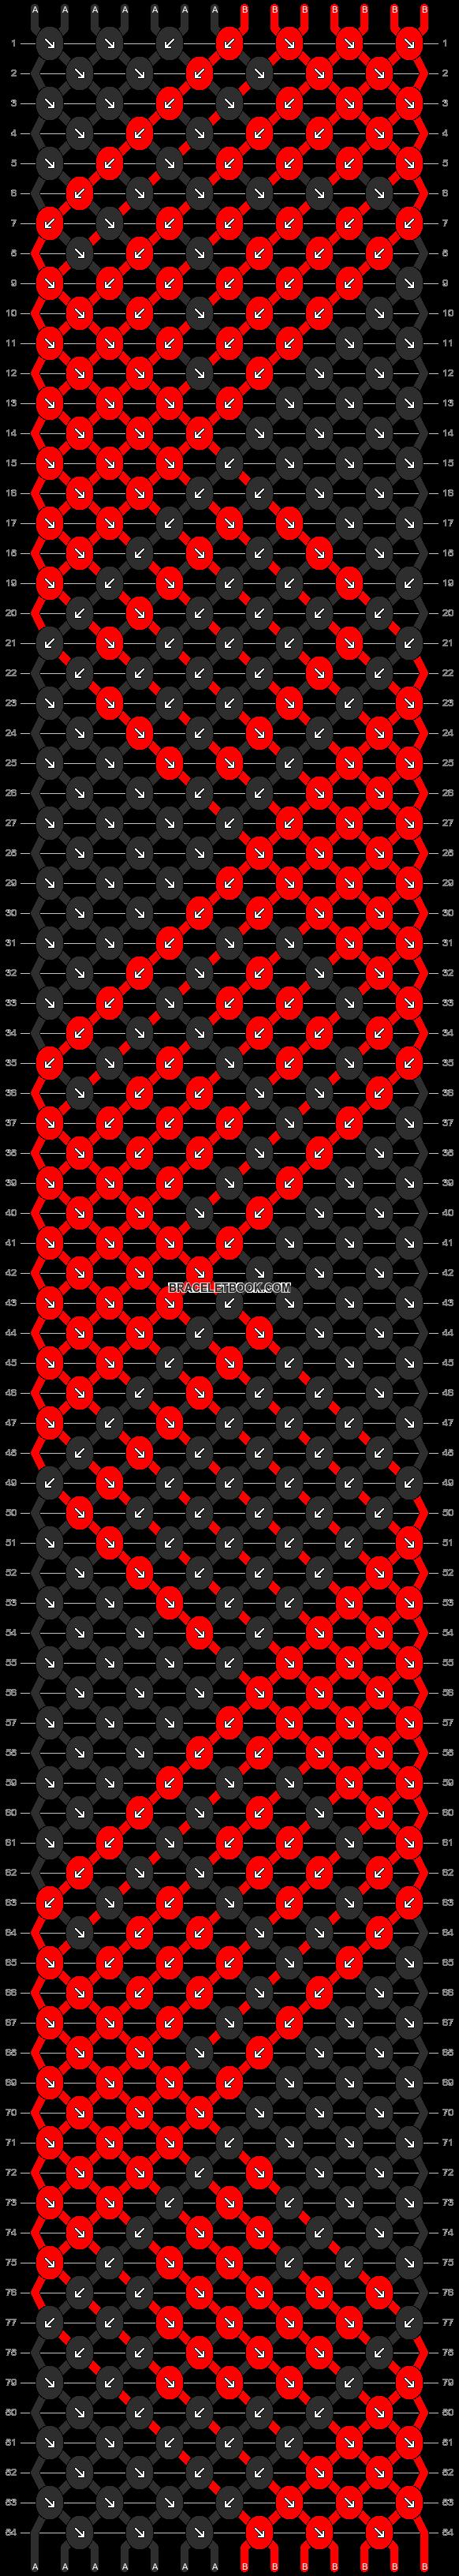 Normal pattern #11352 pattern